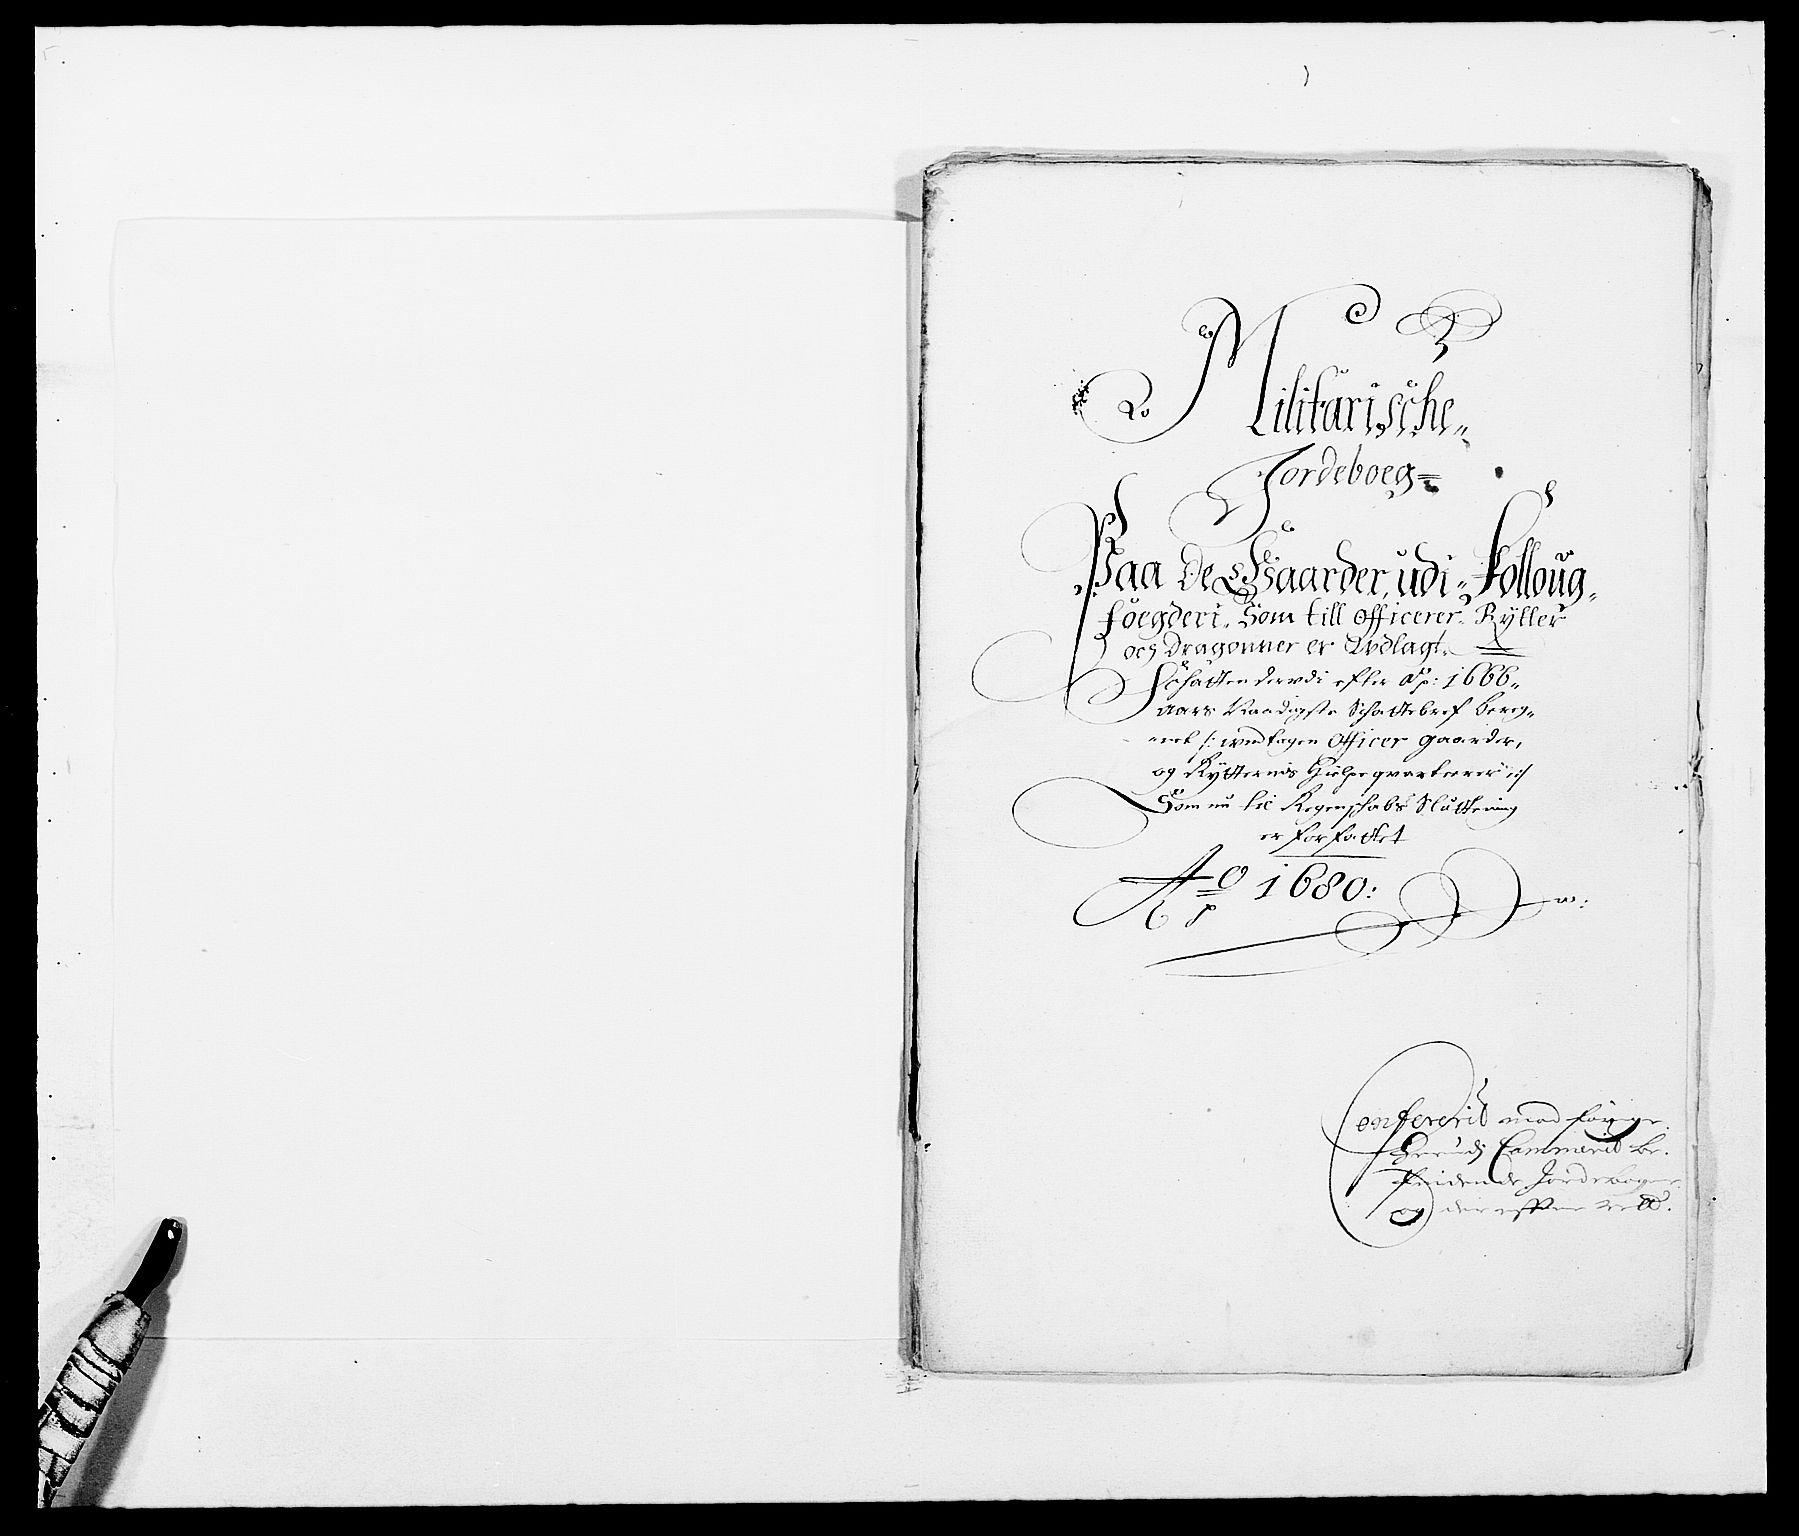 RA, Rentekammeret inntil 1814, Reviderte regnskaper, Fogderegnskap, R09/L0432: Fogderegnskap Follo, 1680-1684, s. 4